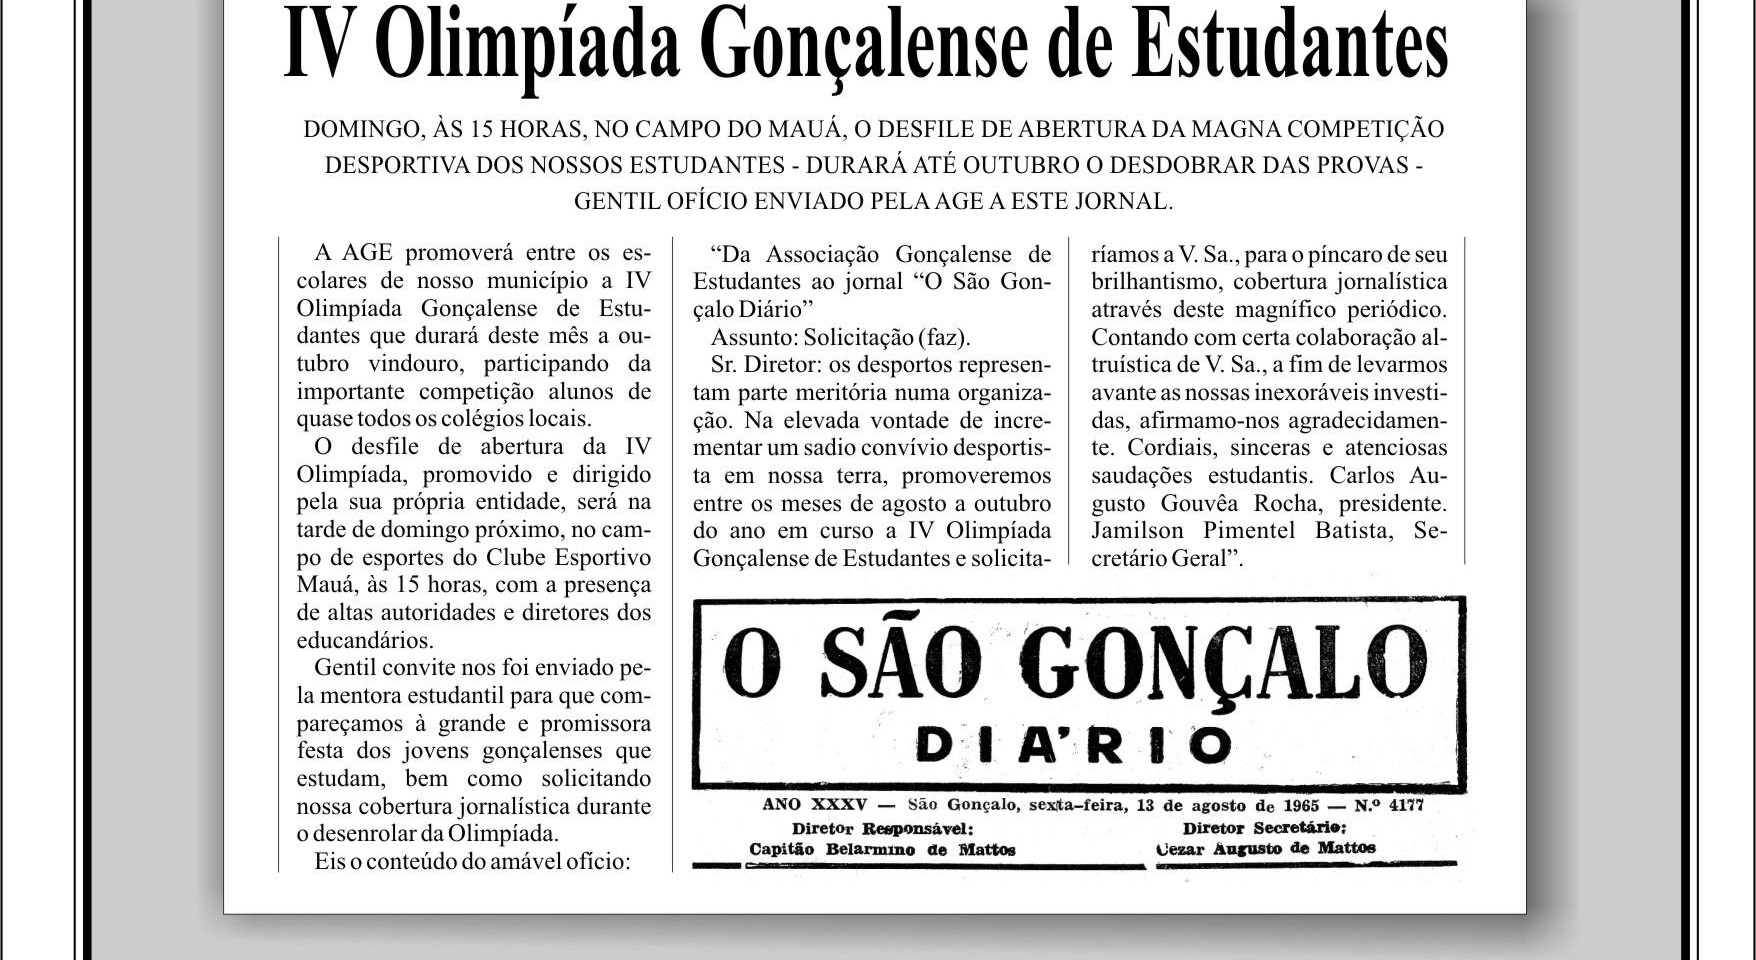 IV Olimpíada Gonçalense de Estudantes